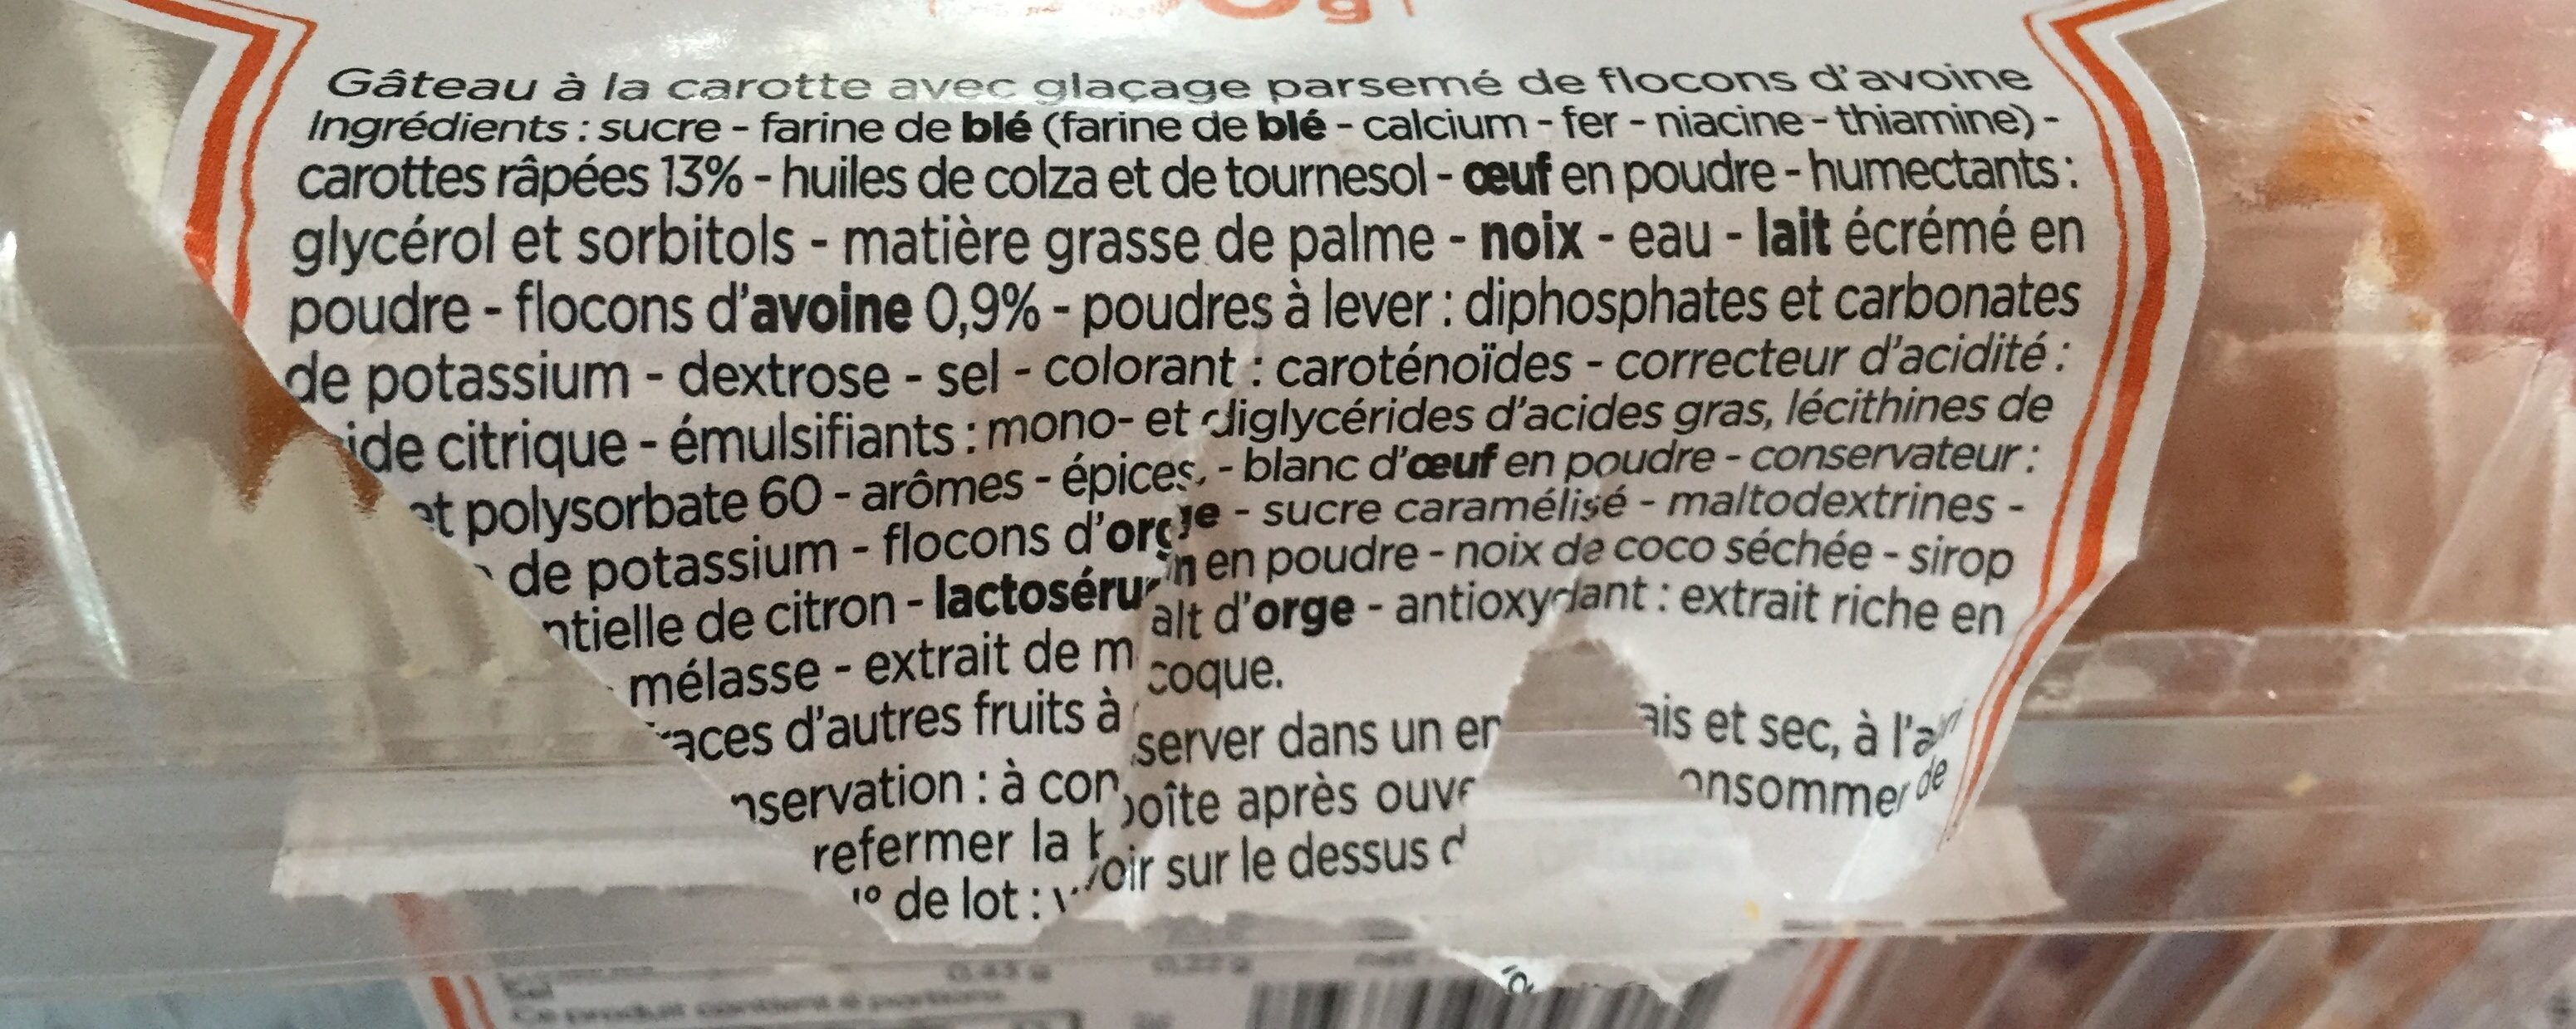 Carrot Cake - Ingrédients - fr